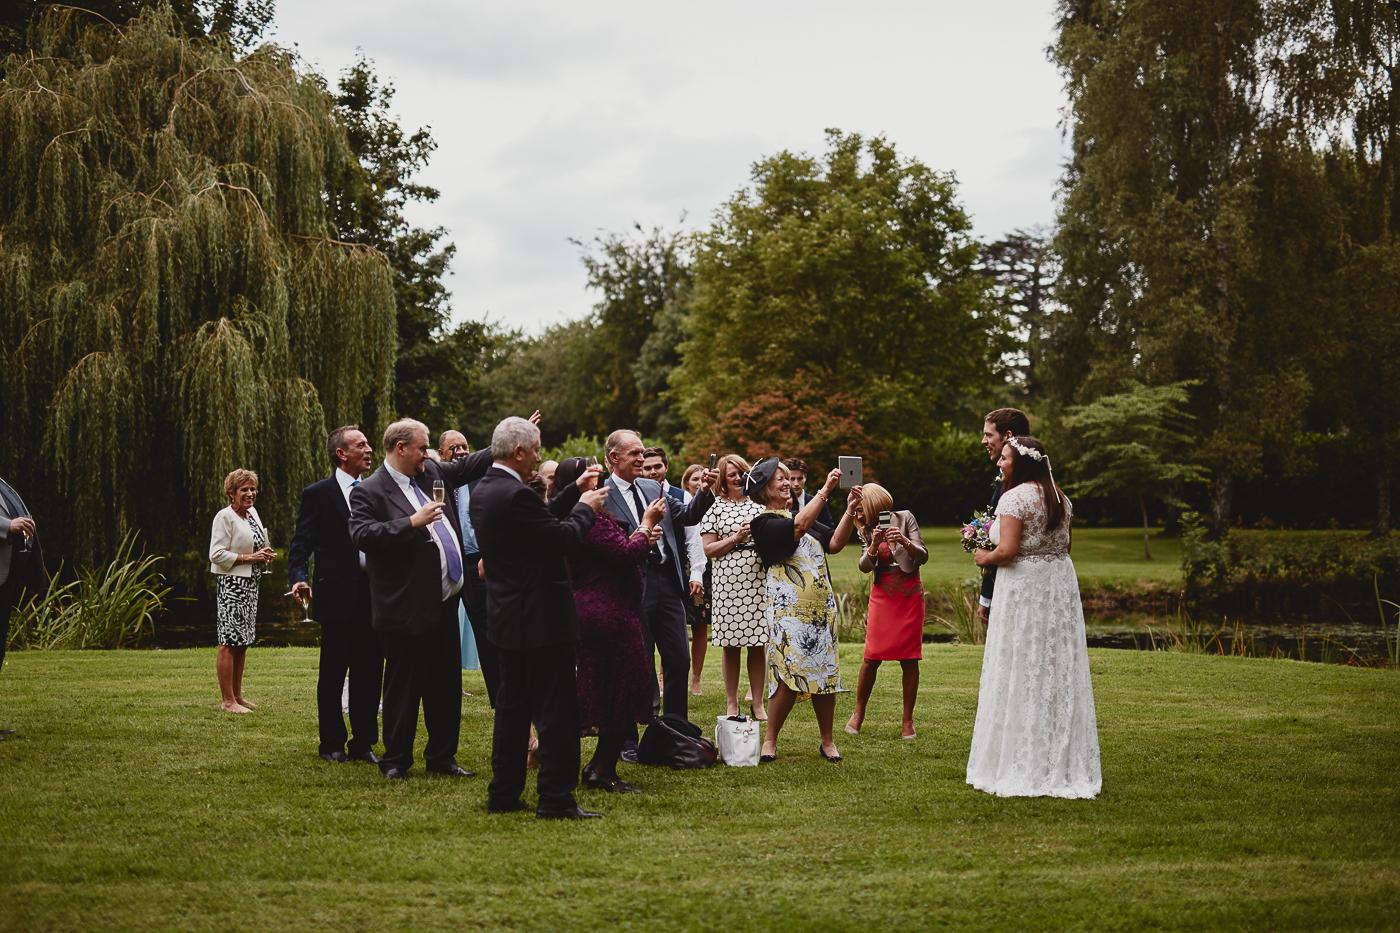 Danni_And_Jack_Gloucester_Wedding-111.jpg